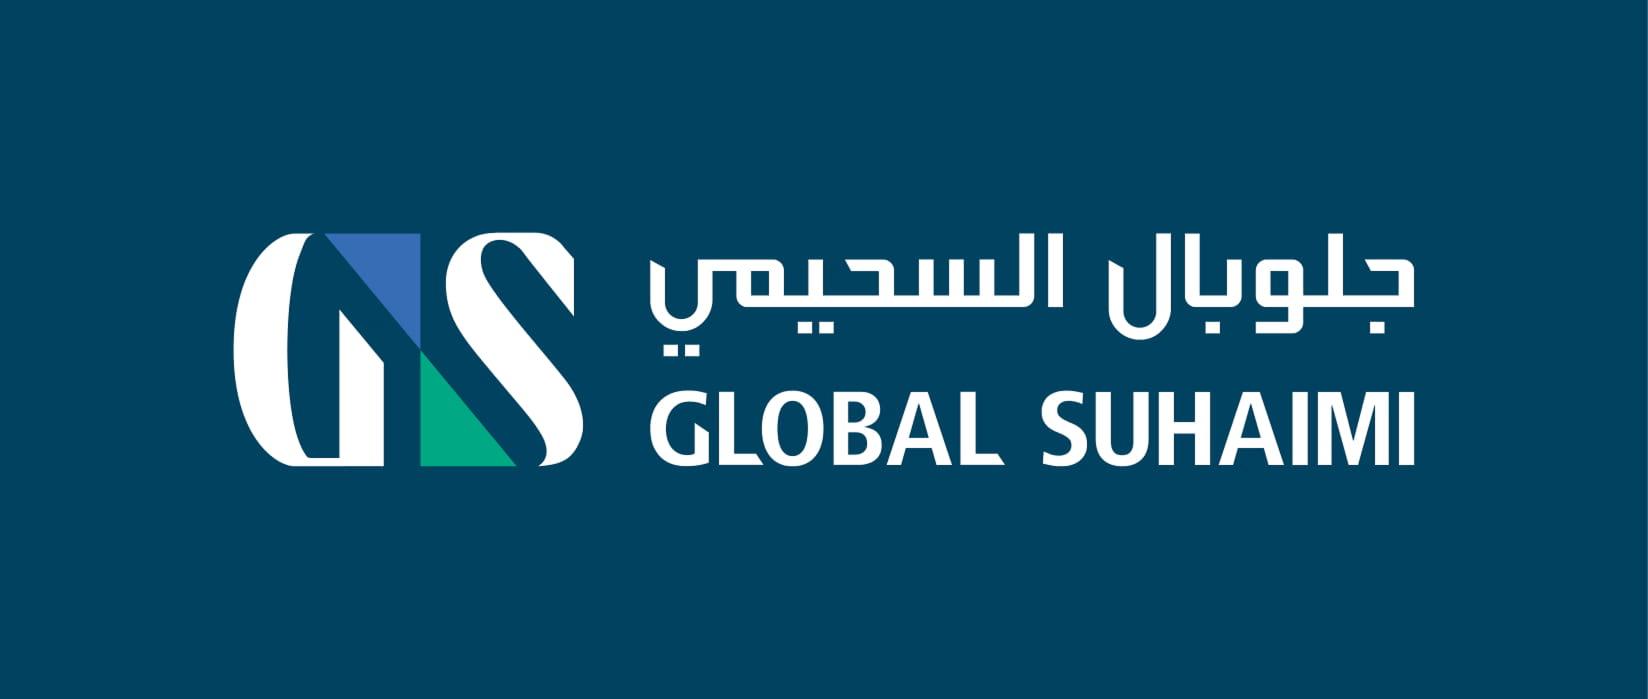 GLOBAL SUHAIMI